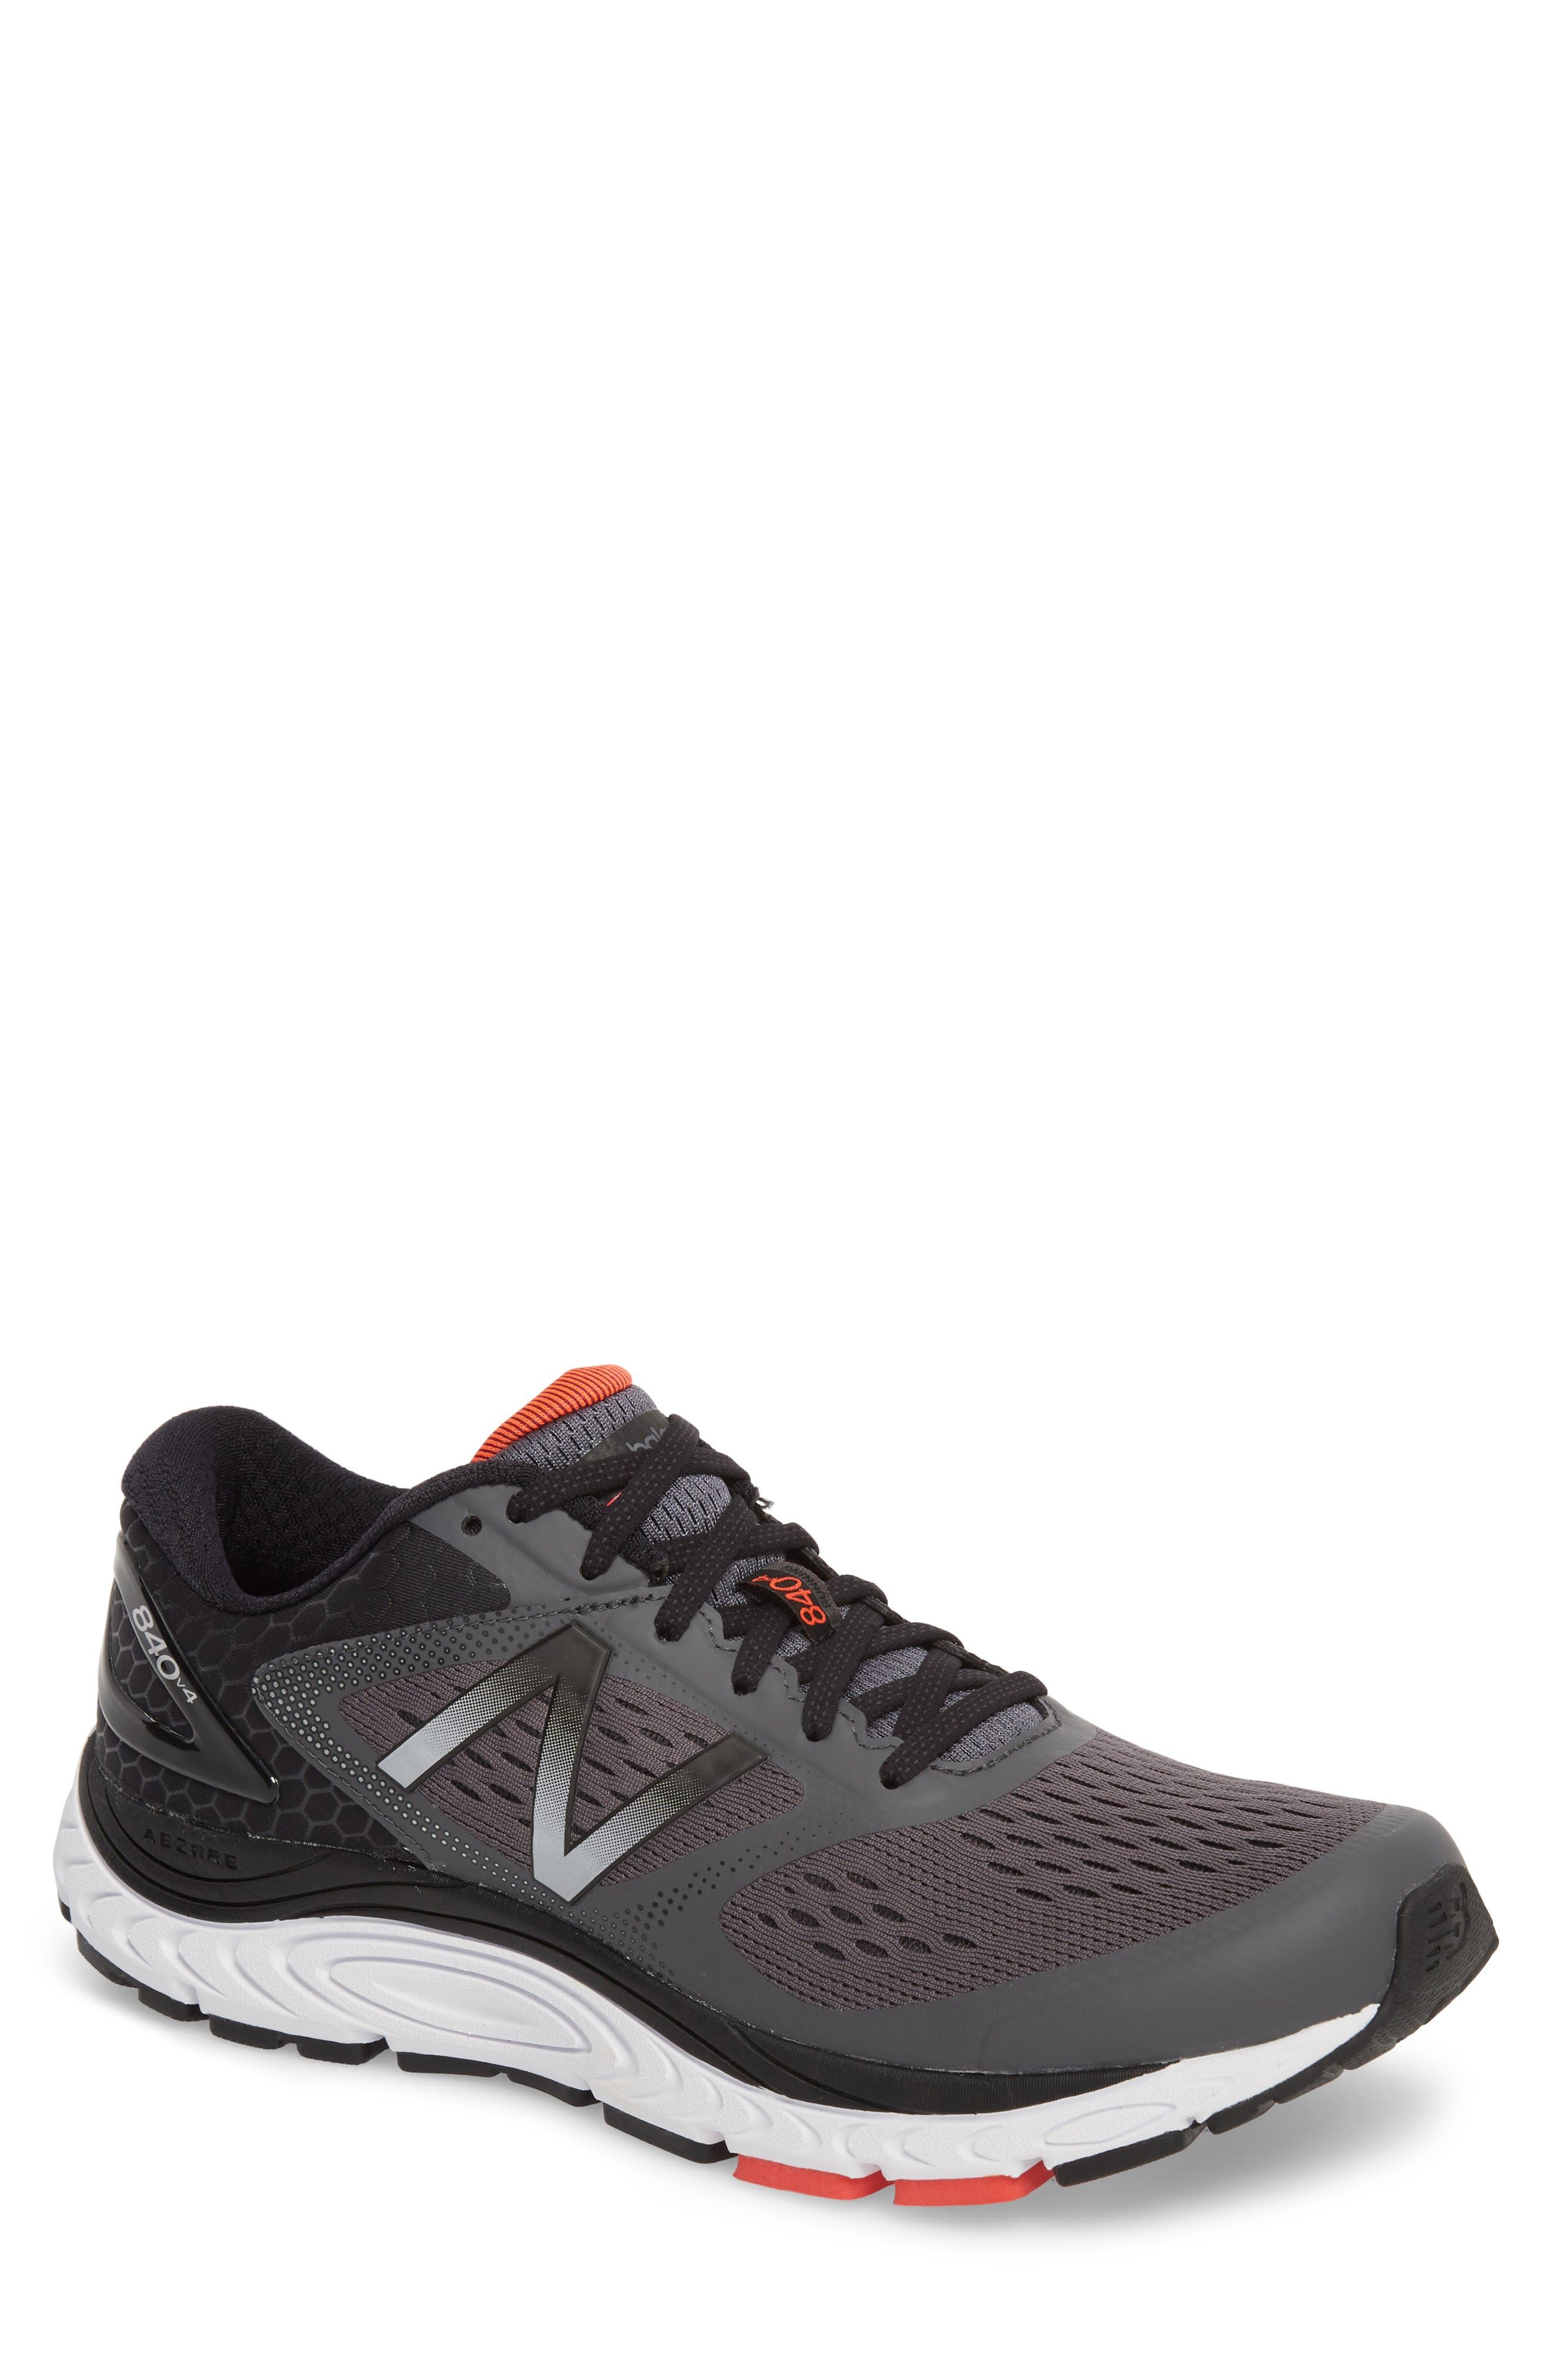 840v4 Running Shoe,                         Main,                         color,